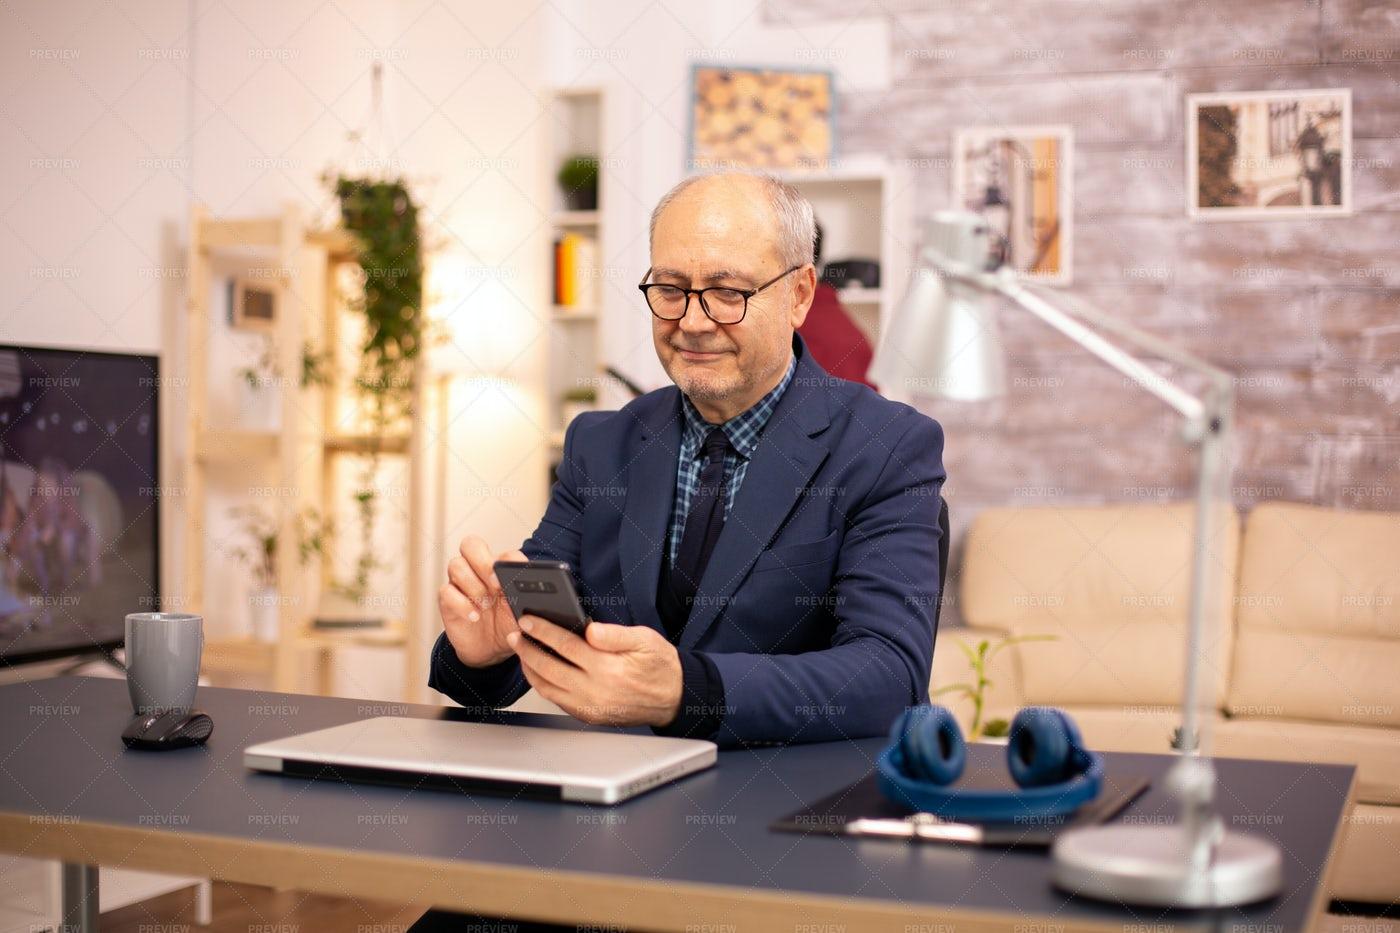 Old Man Browsing Phone: Stock Photos